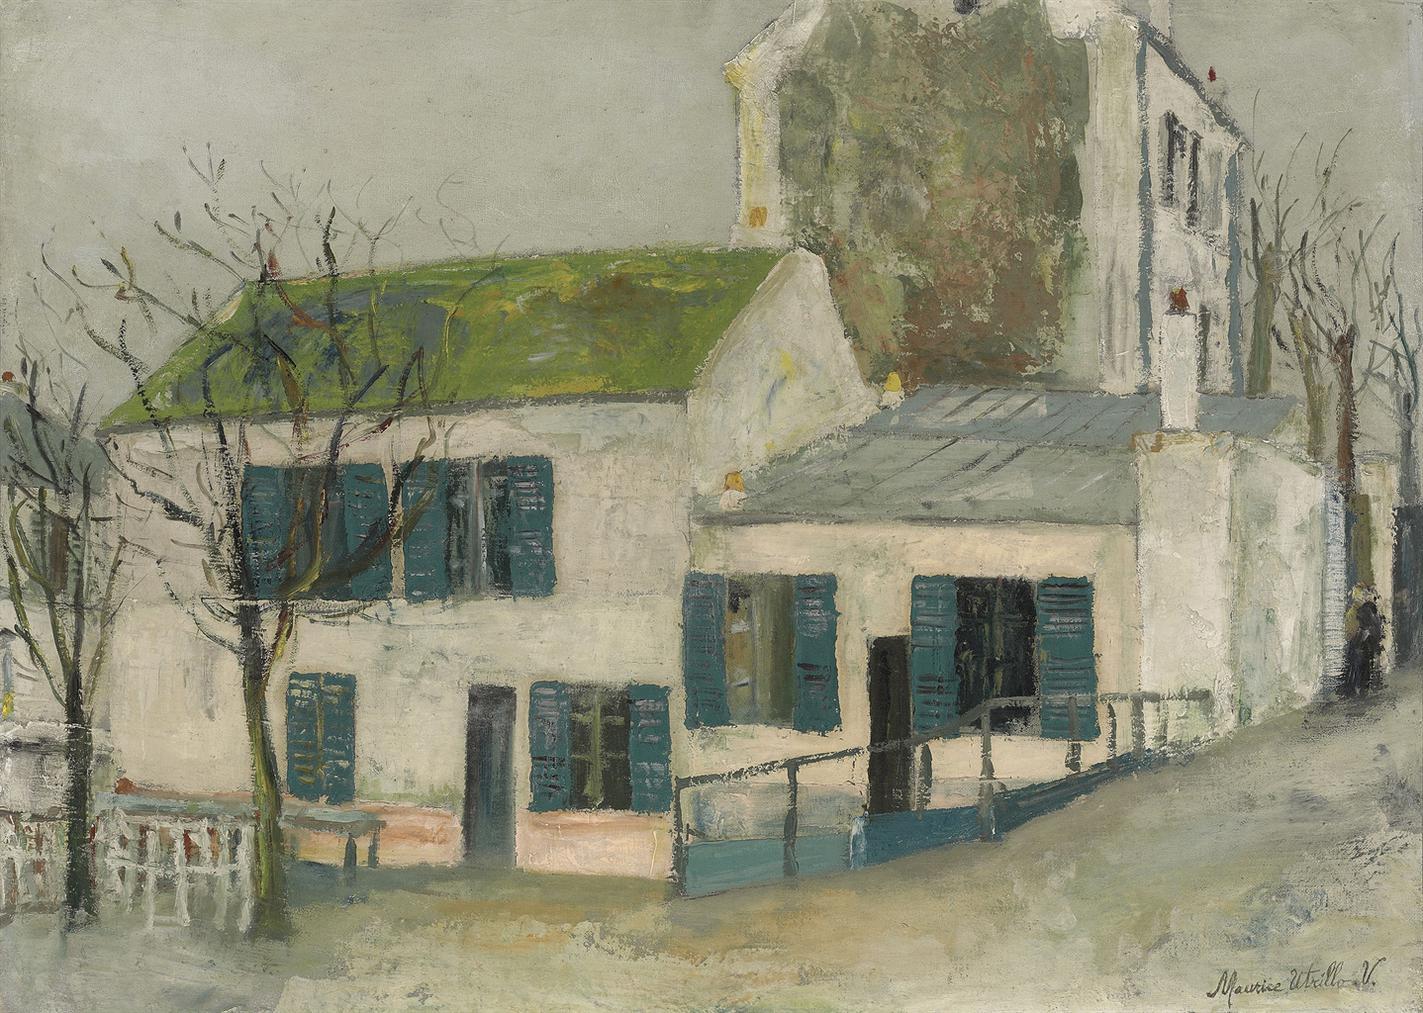 Maurice Utrillo-Le Lapin Agile A Montmartre-1911